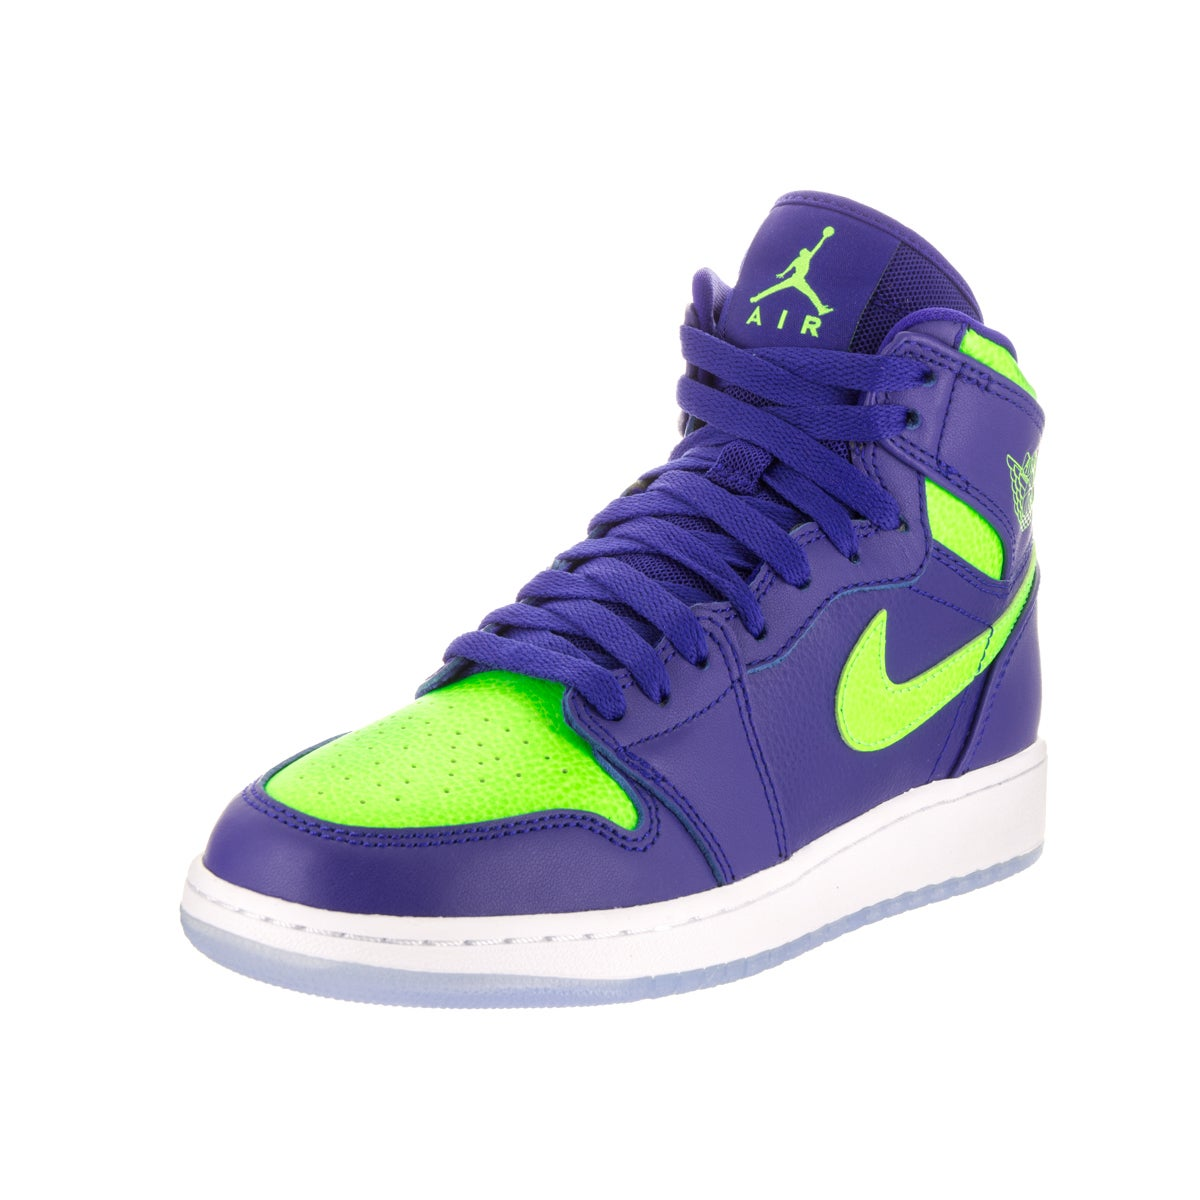 sports shoes f5106 a52db Nike Jordan Kids Air Jordan 1 Retro Blue and Green High-top Basketball Shoes